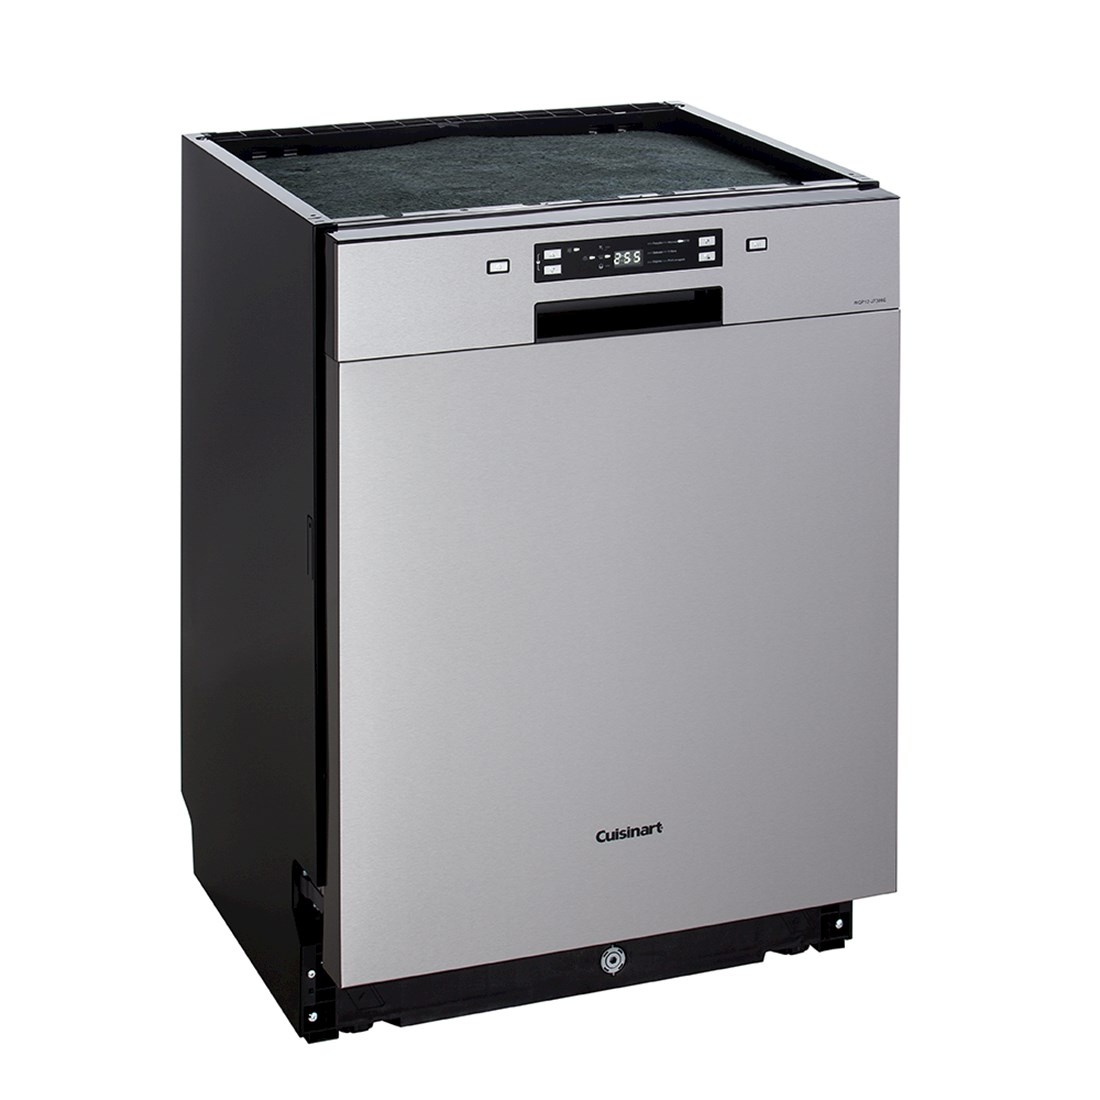 Lava-Louças de Embutir Cuisinart Prime Cooking 14 serviços Inox 60cm 220V